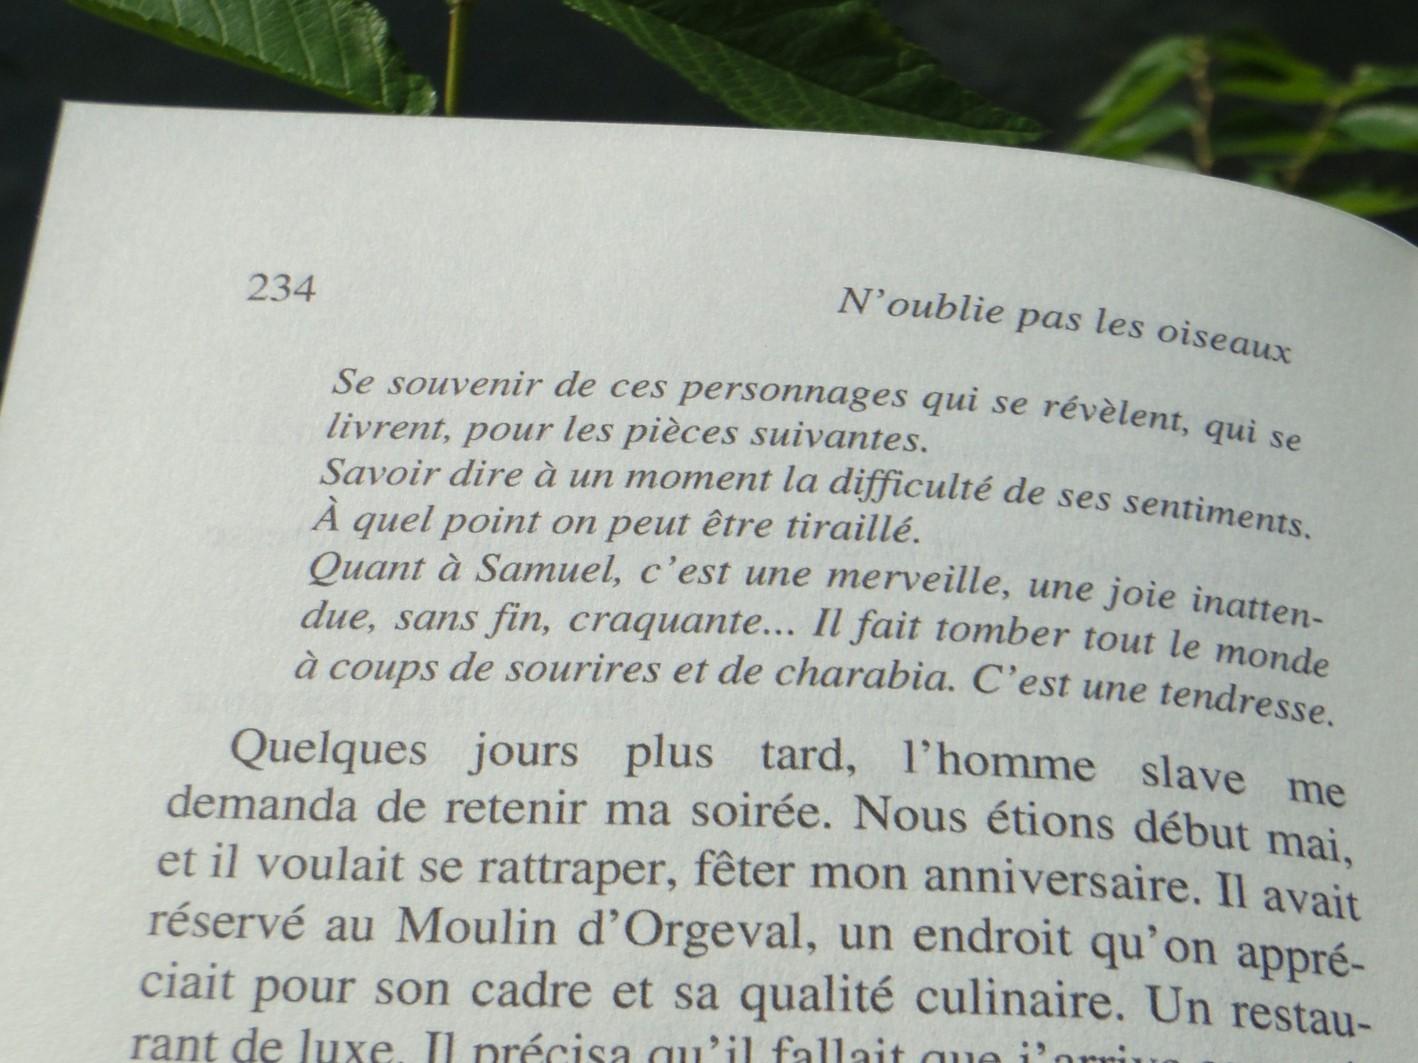 N'OUBLIES PAS LES OISEAUX Murielle Magellan - Go with the Blog 2